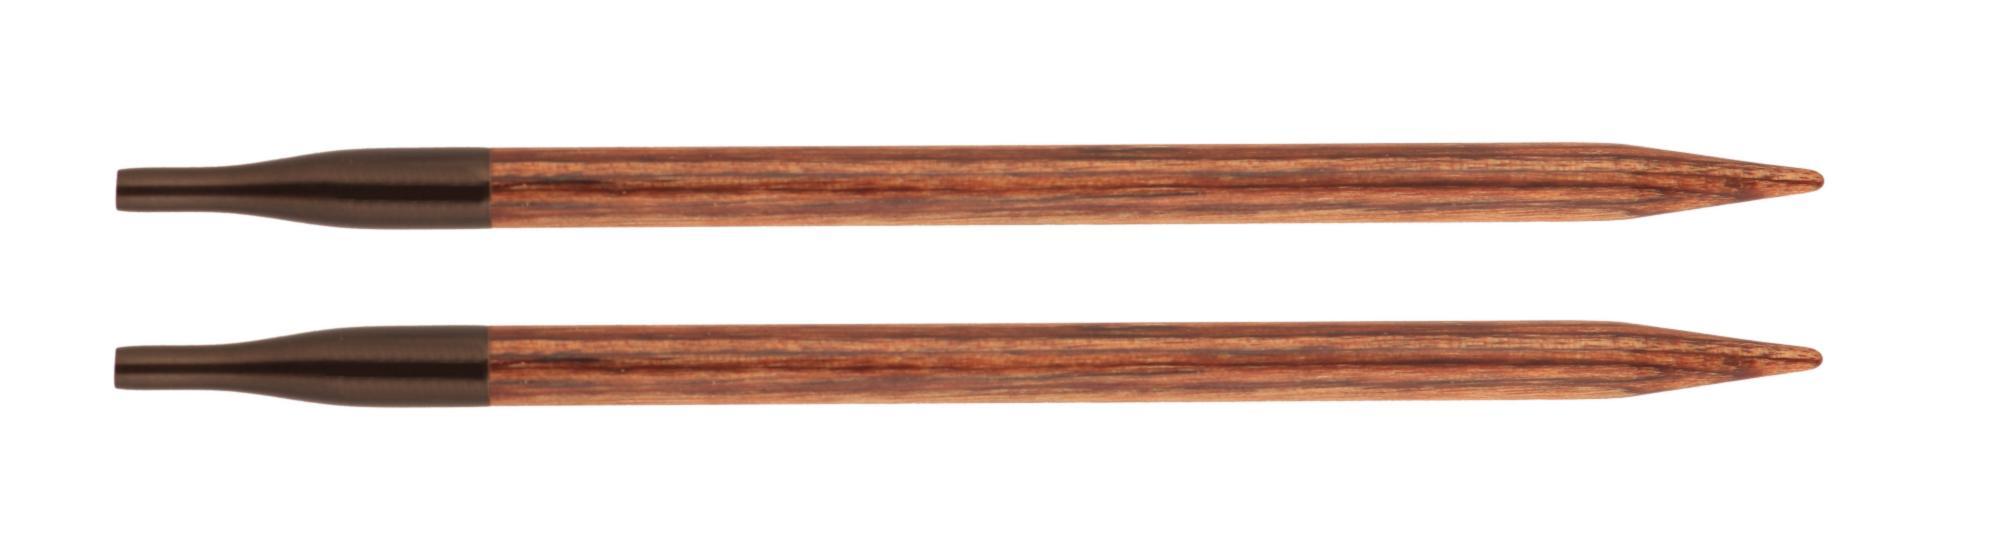 31215 Спицы съемные 12.00 мм Ginger KnitPro